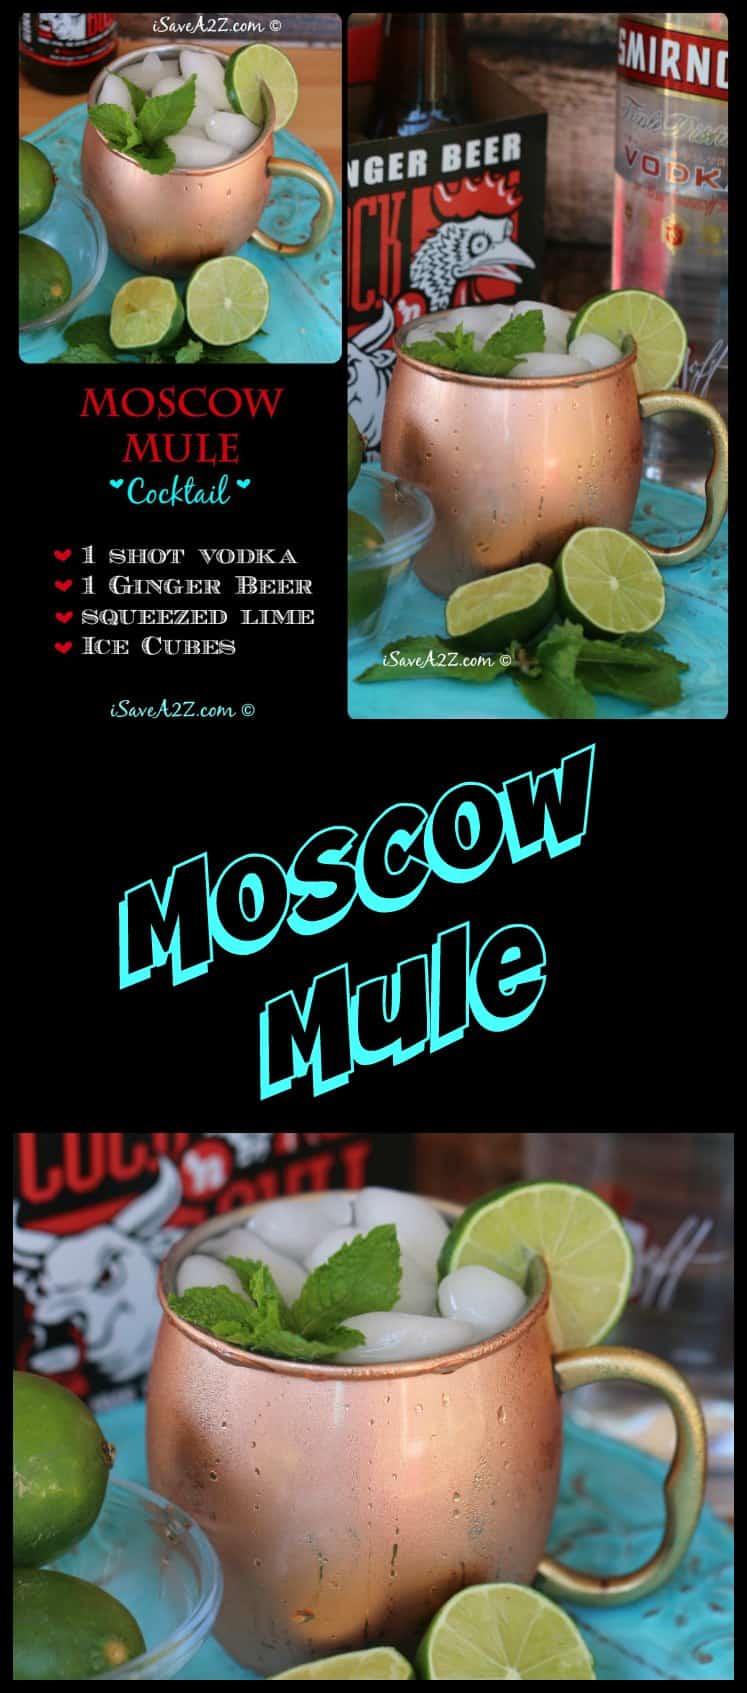 Moscow Mule Drink Recipe using my favorite Moscow Mule Mugs